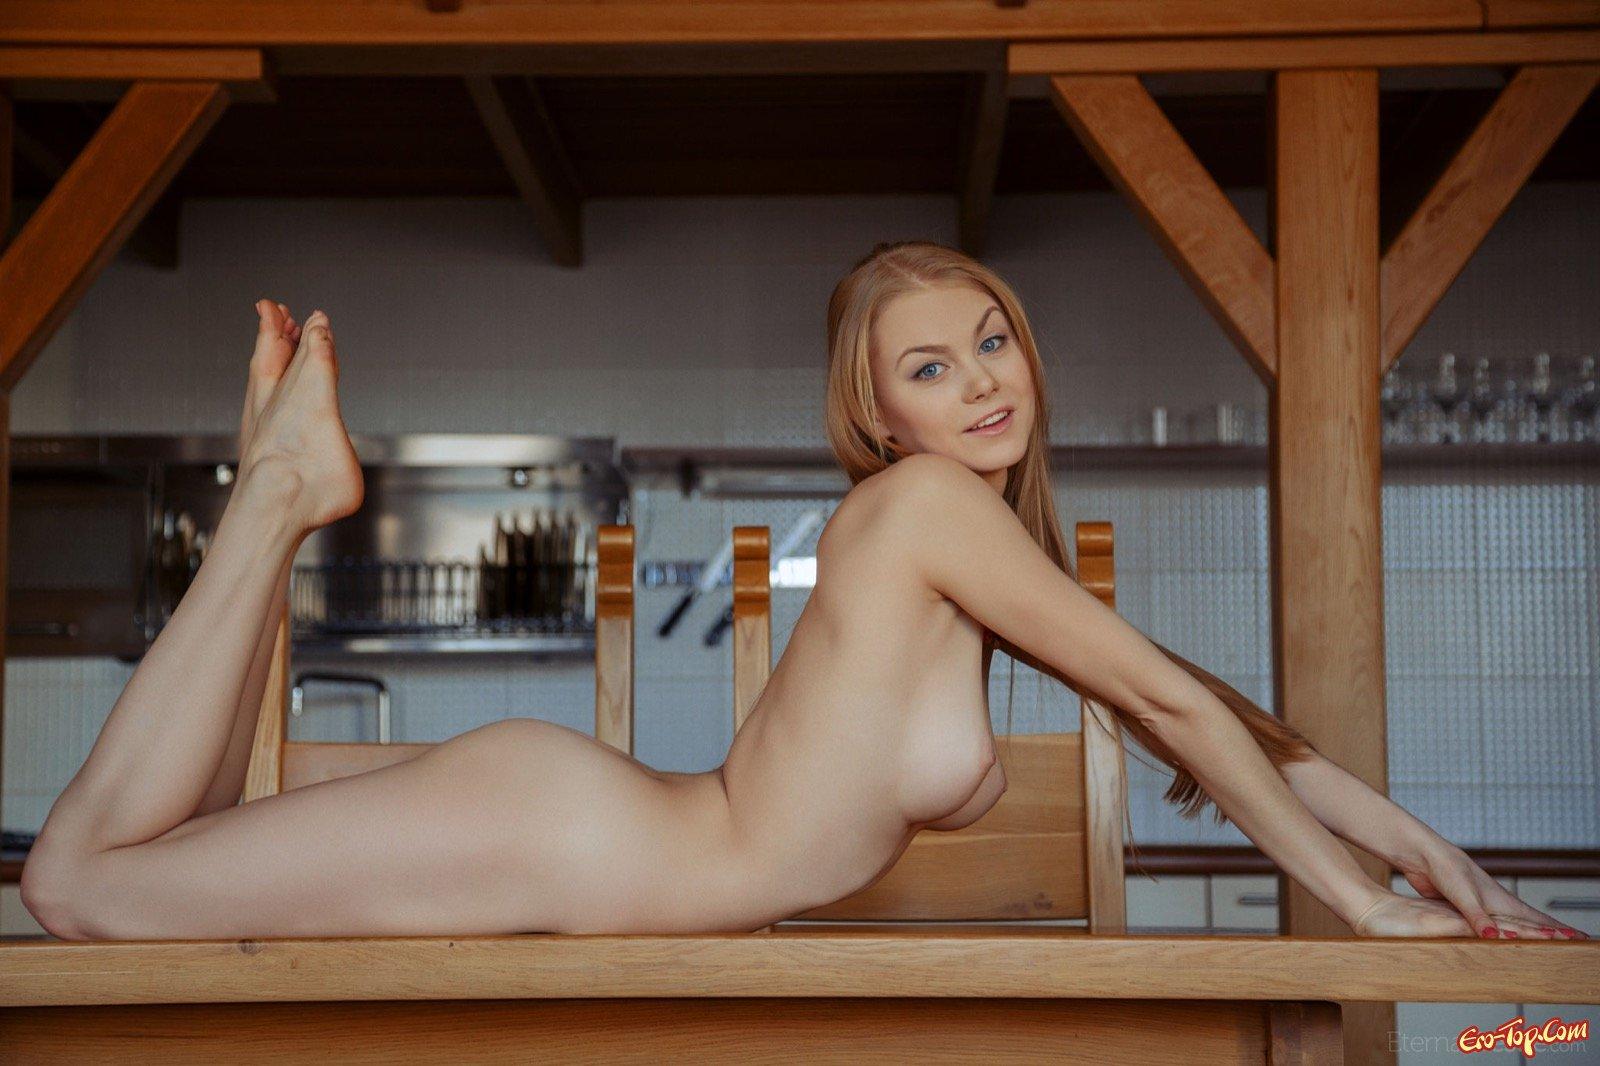 Голая тёлка показала красивое тело на кухонном столе